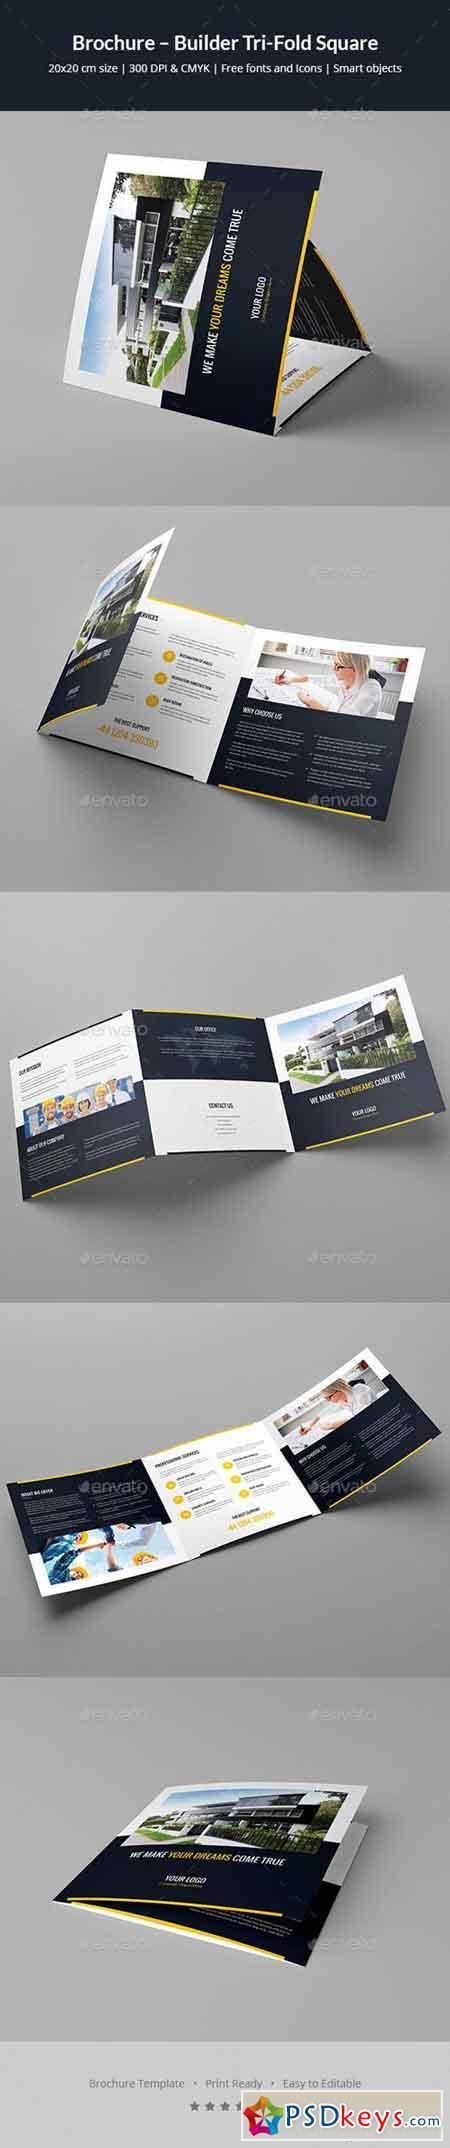 Brochure – Builder Tri-Fold Square 20247905 » Free Download